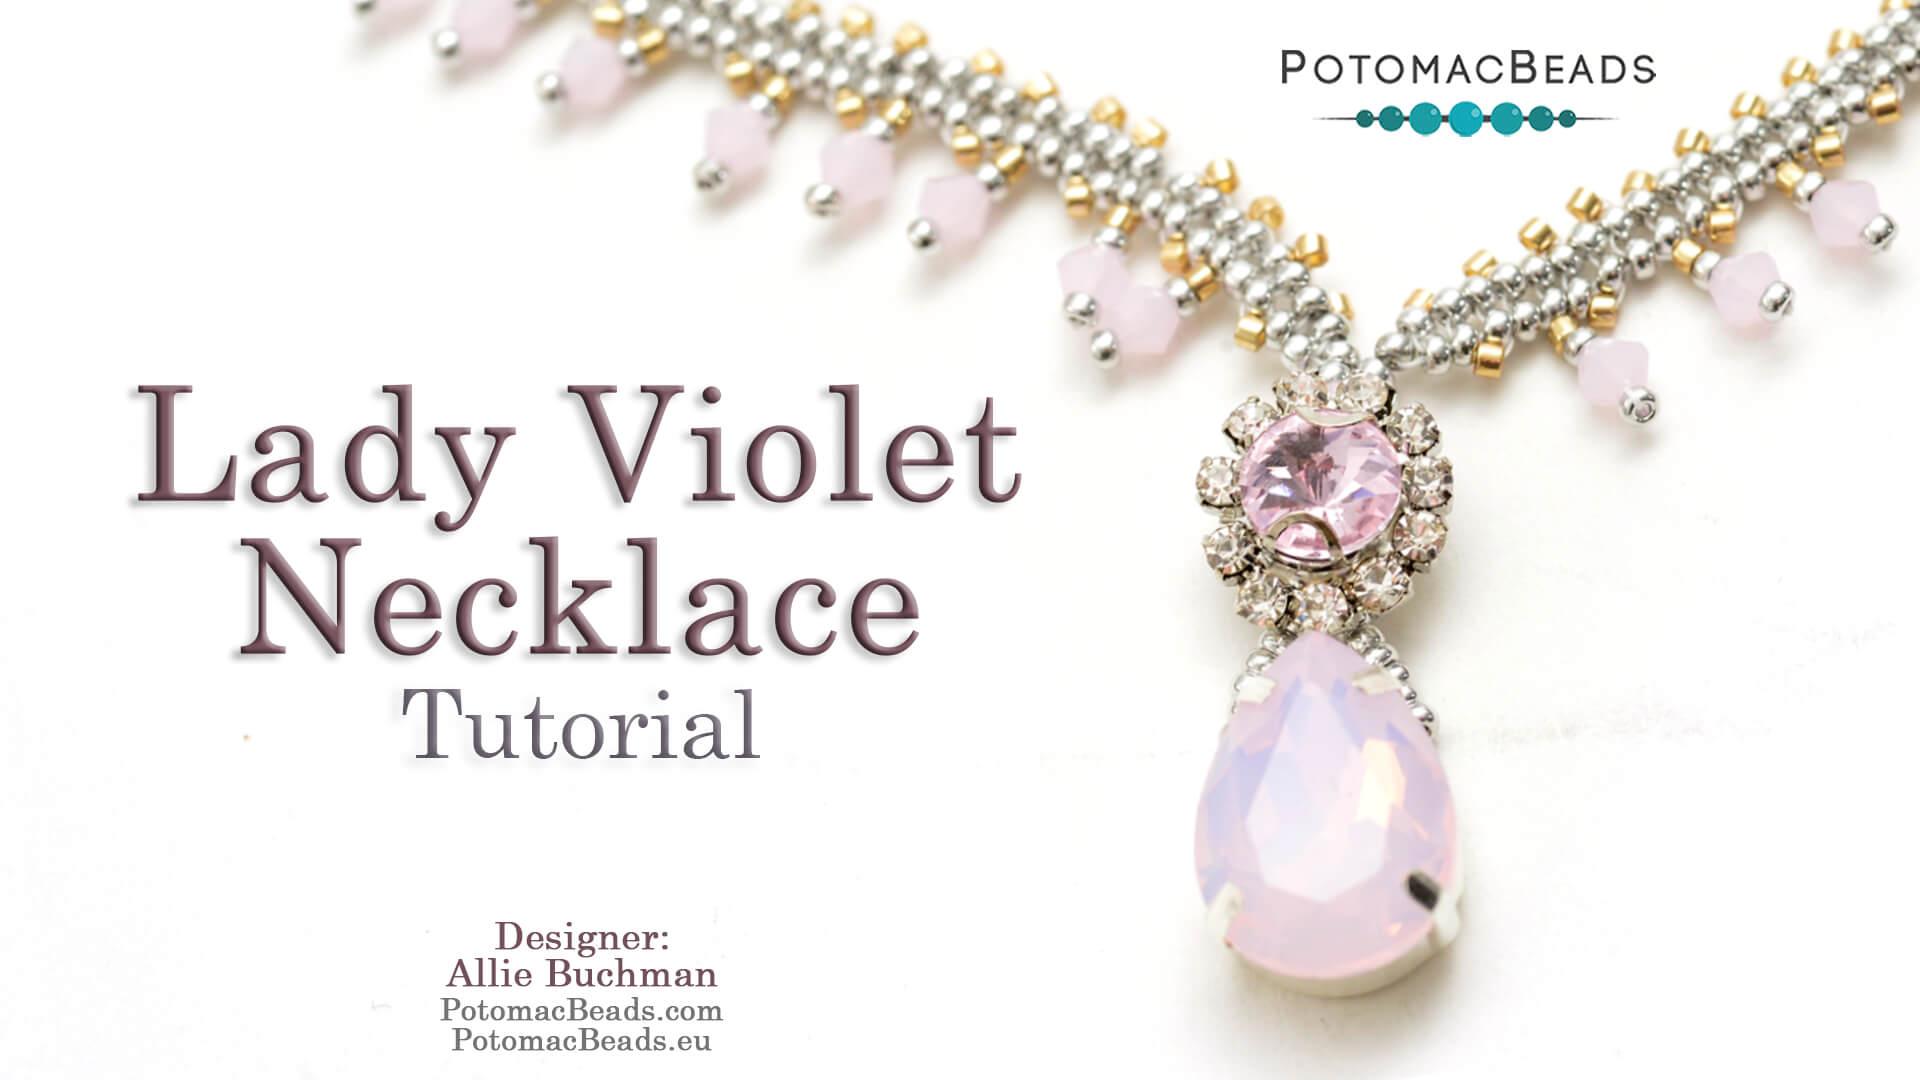 How to Bead Jewelry / Beading Tutorials & Jewel Making Videos / Bead Weaving Tutorials & Necklace Tutorial / Lady Violet Necklace Tutorial